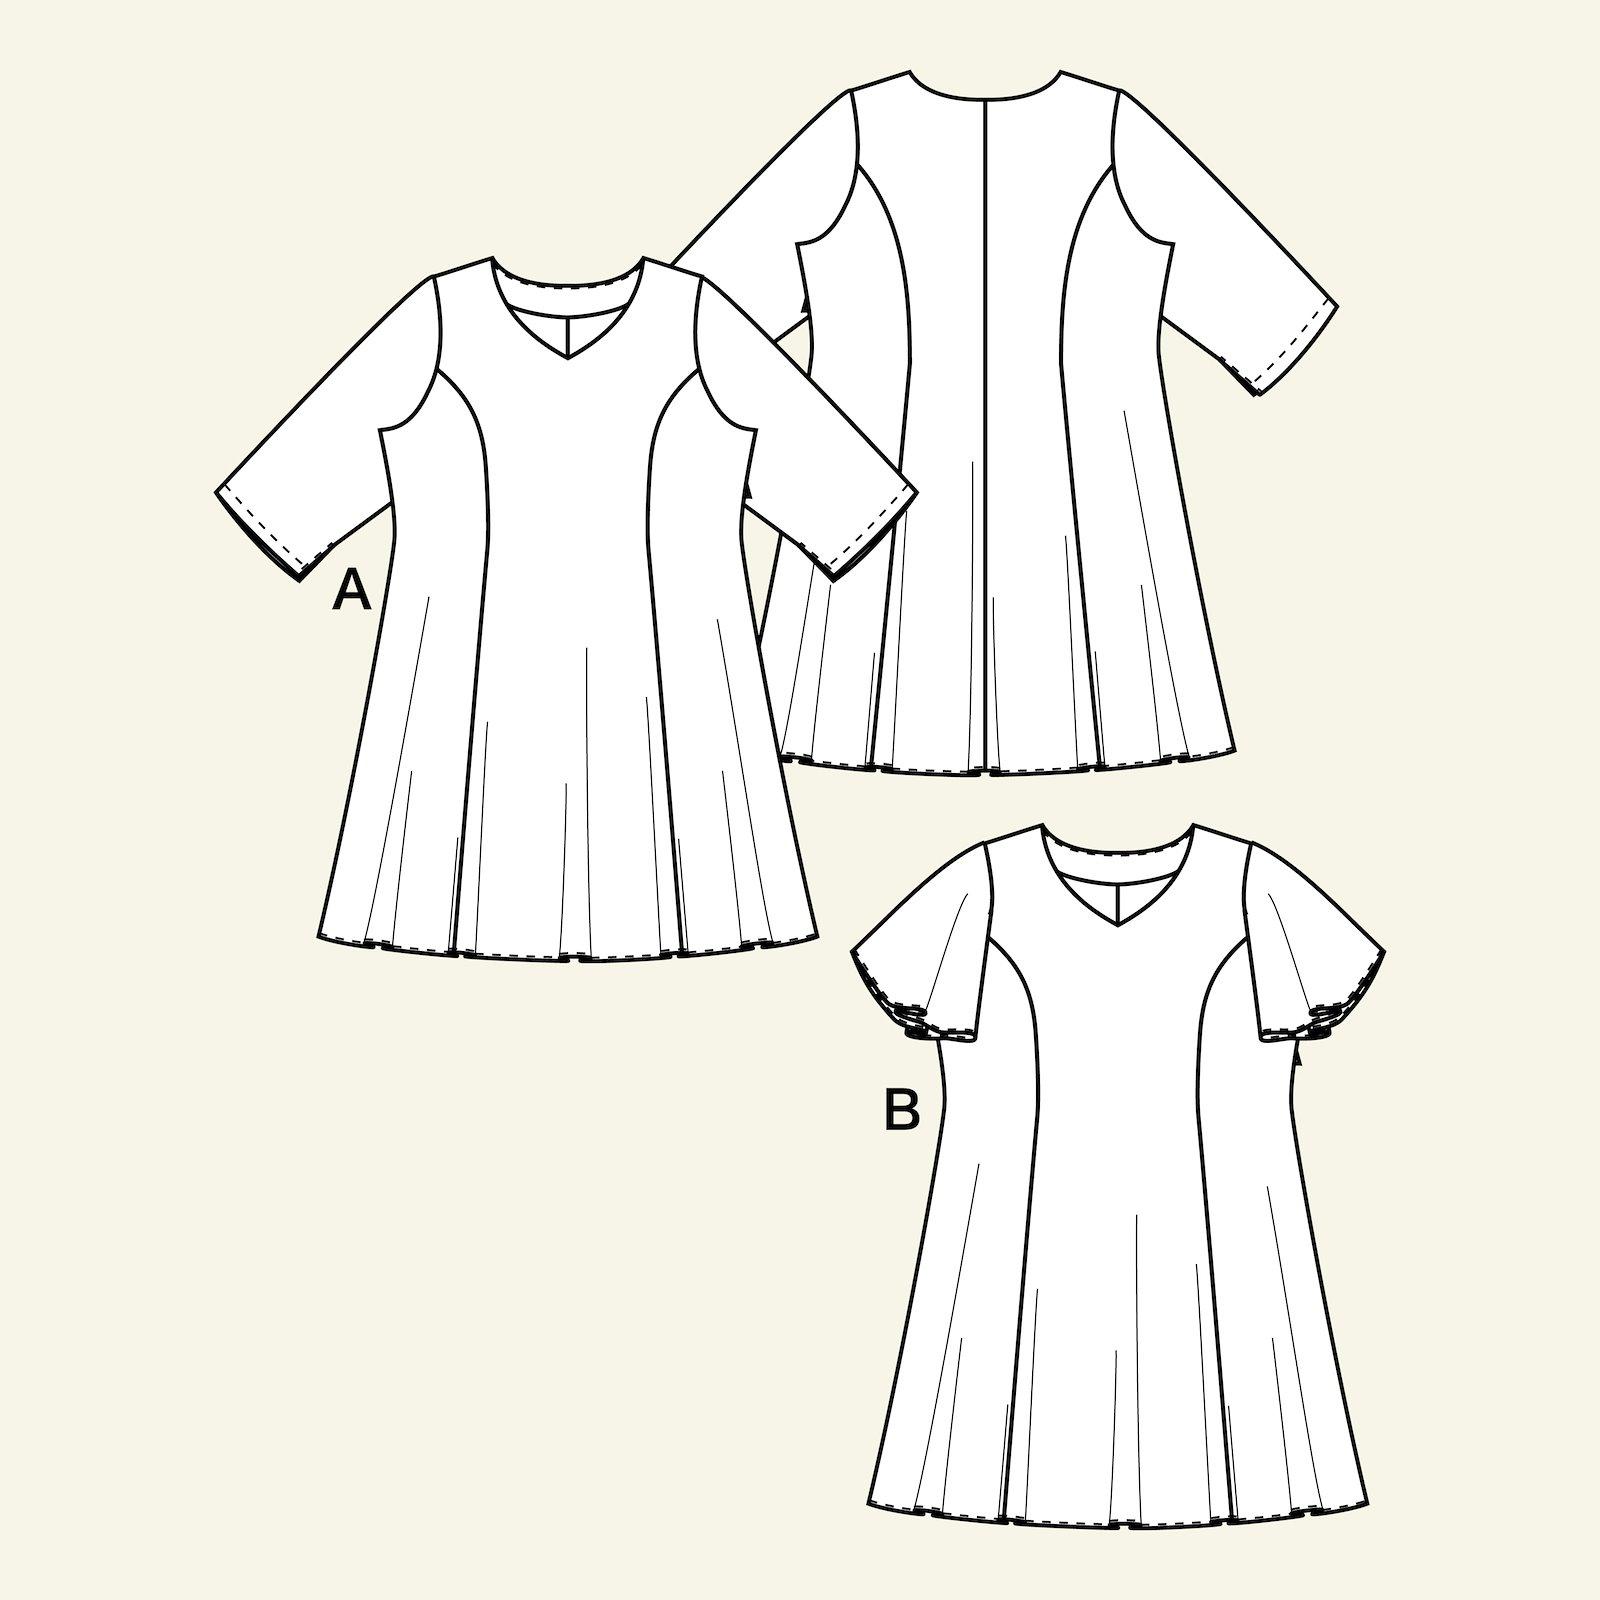 Dress with a princess cut, 54/26 p73016_pack